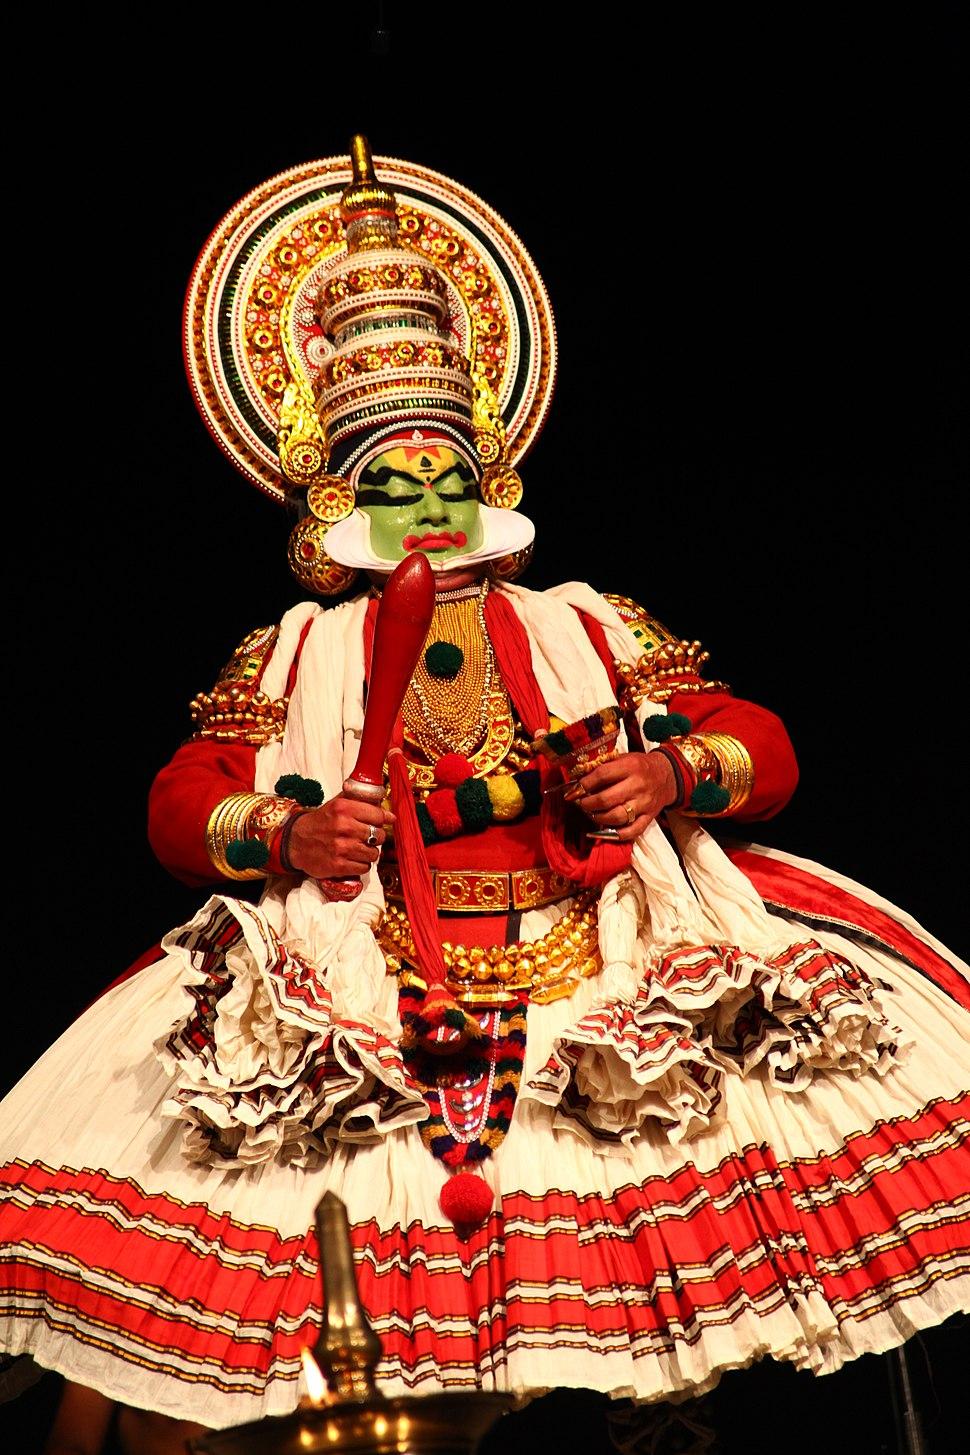 Kathakali IMG 0348 by Joseph Lazer